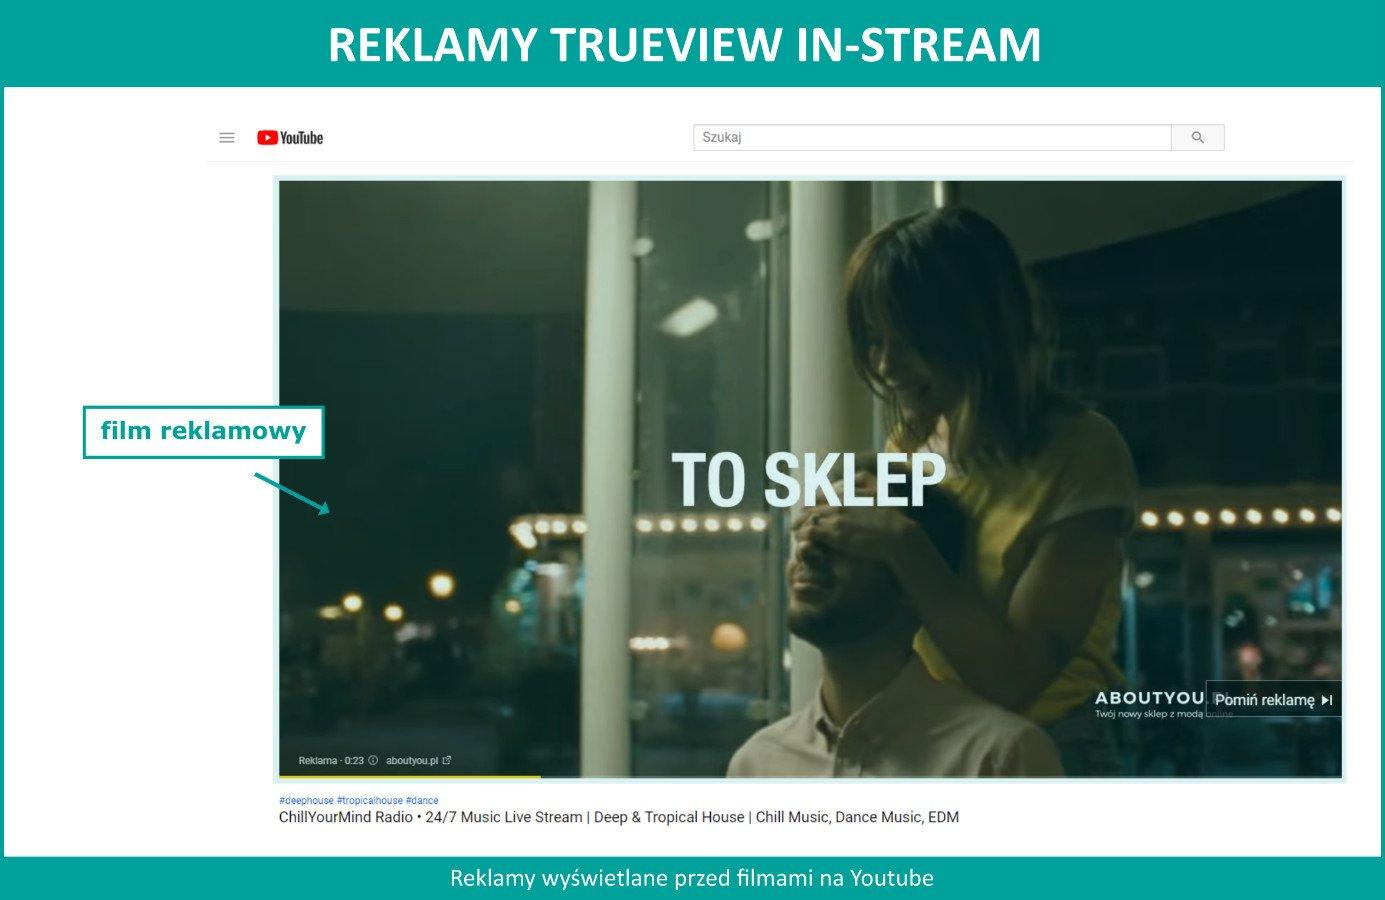 Reklama YouTube Ads - TrueView In-stream